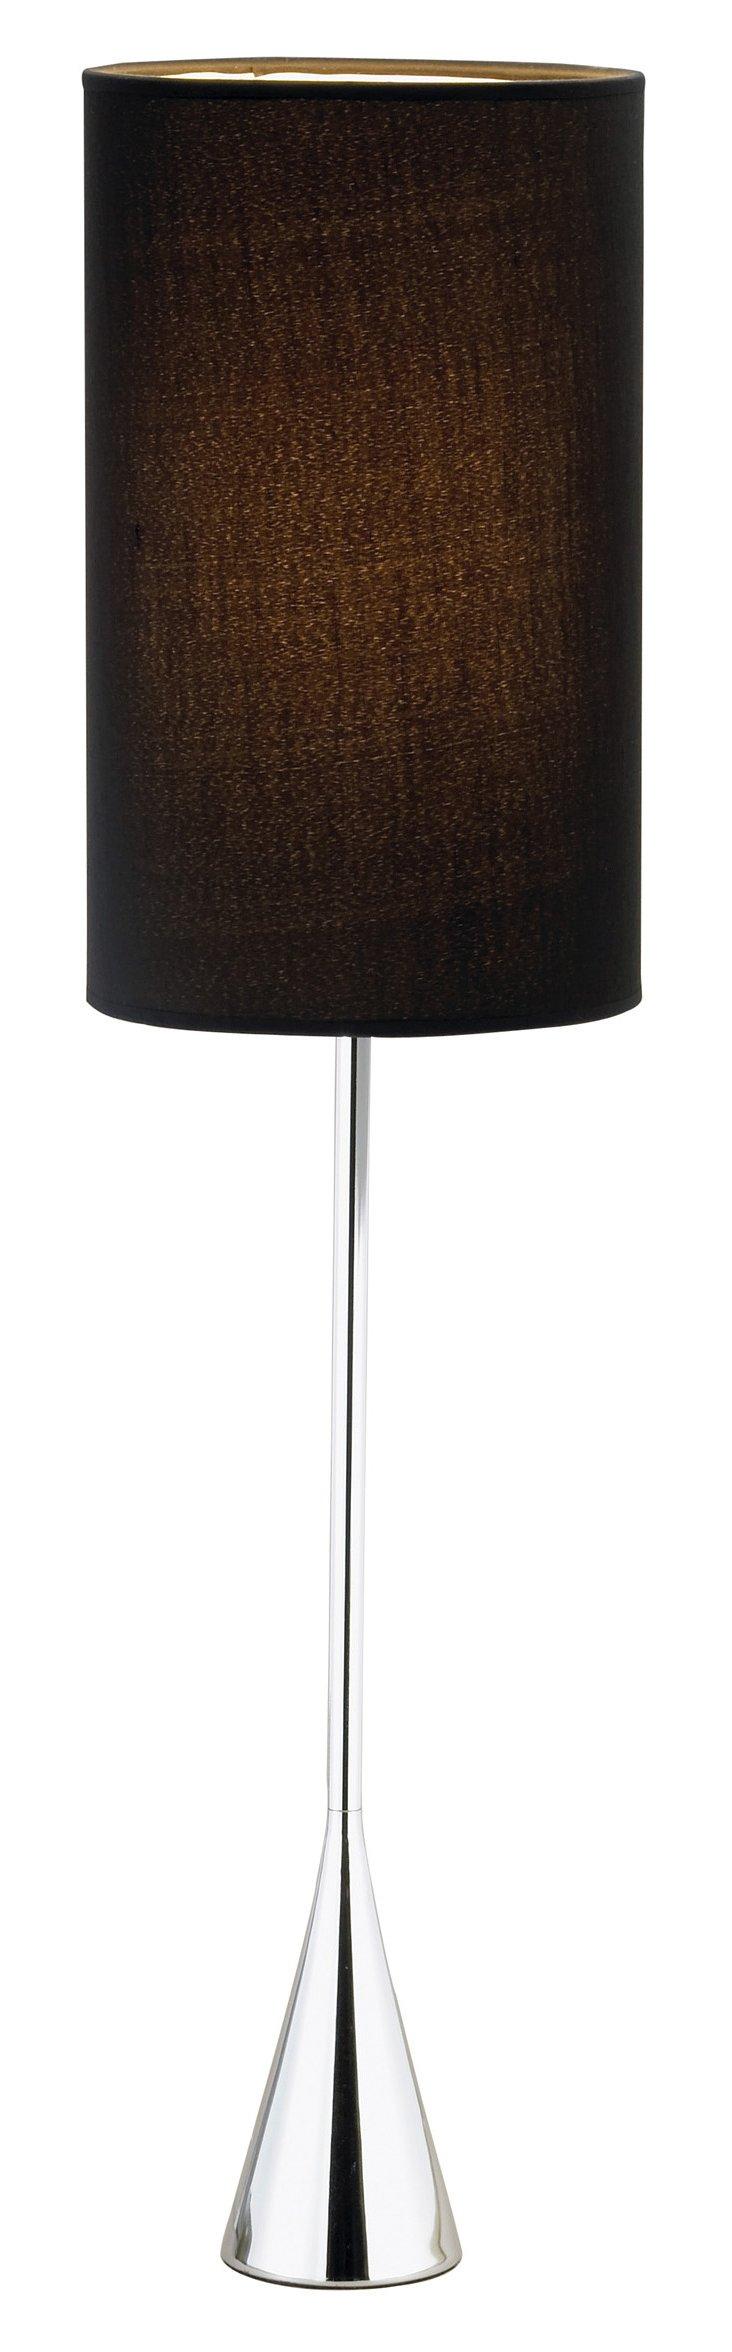 Bella Table Lamp, Chrome